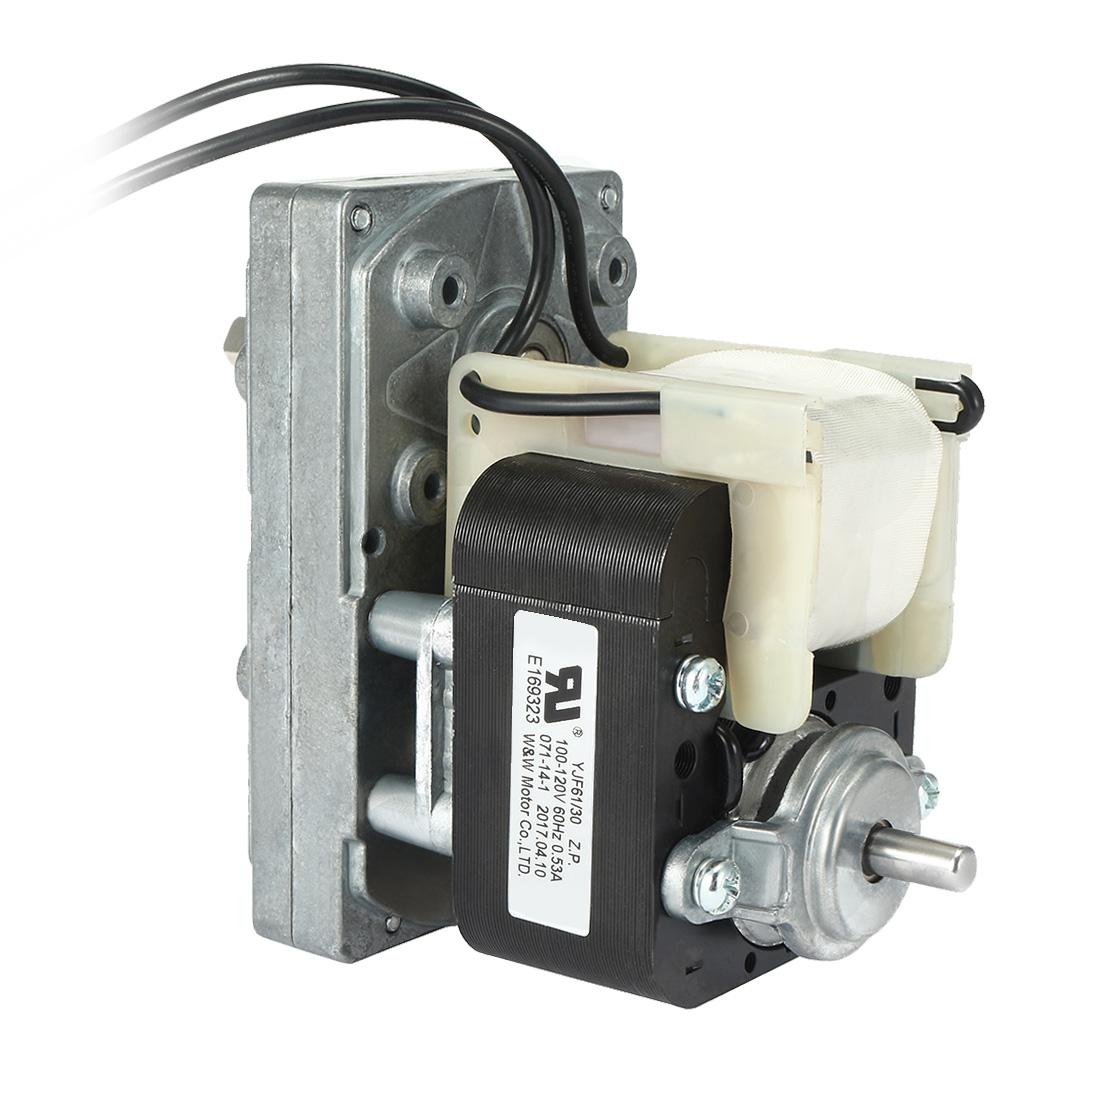 FC-YJ61 AC100V-120V 60Hz 41RPM CCW Shaded Pole Motor Universal Geared Motor